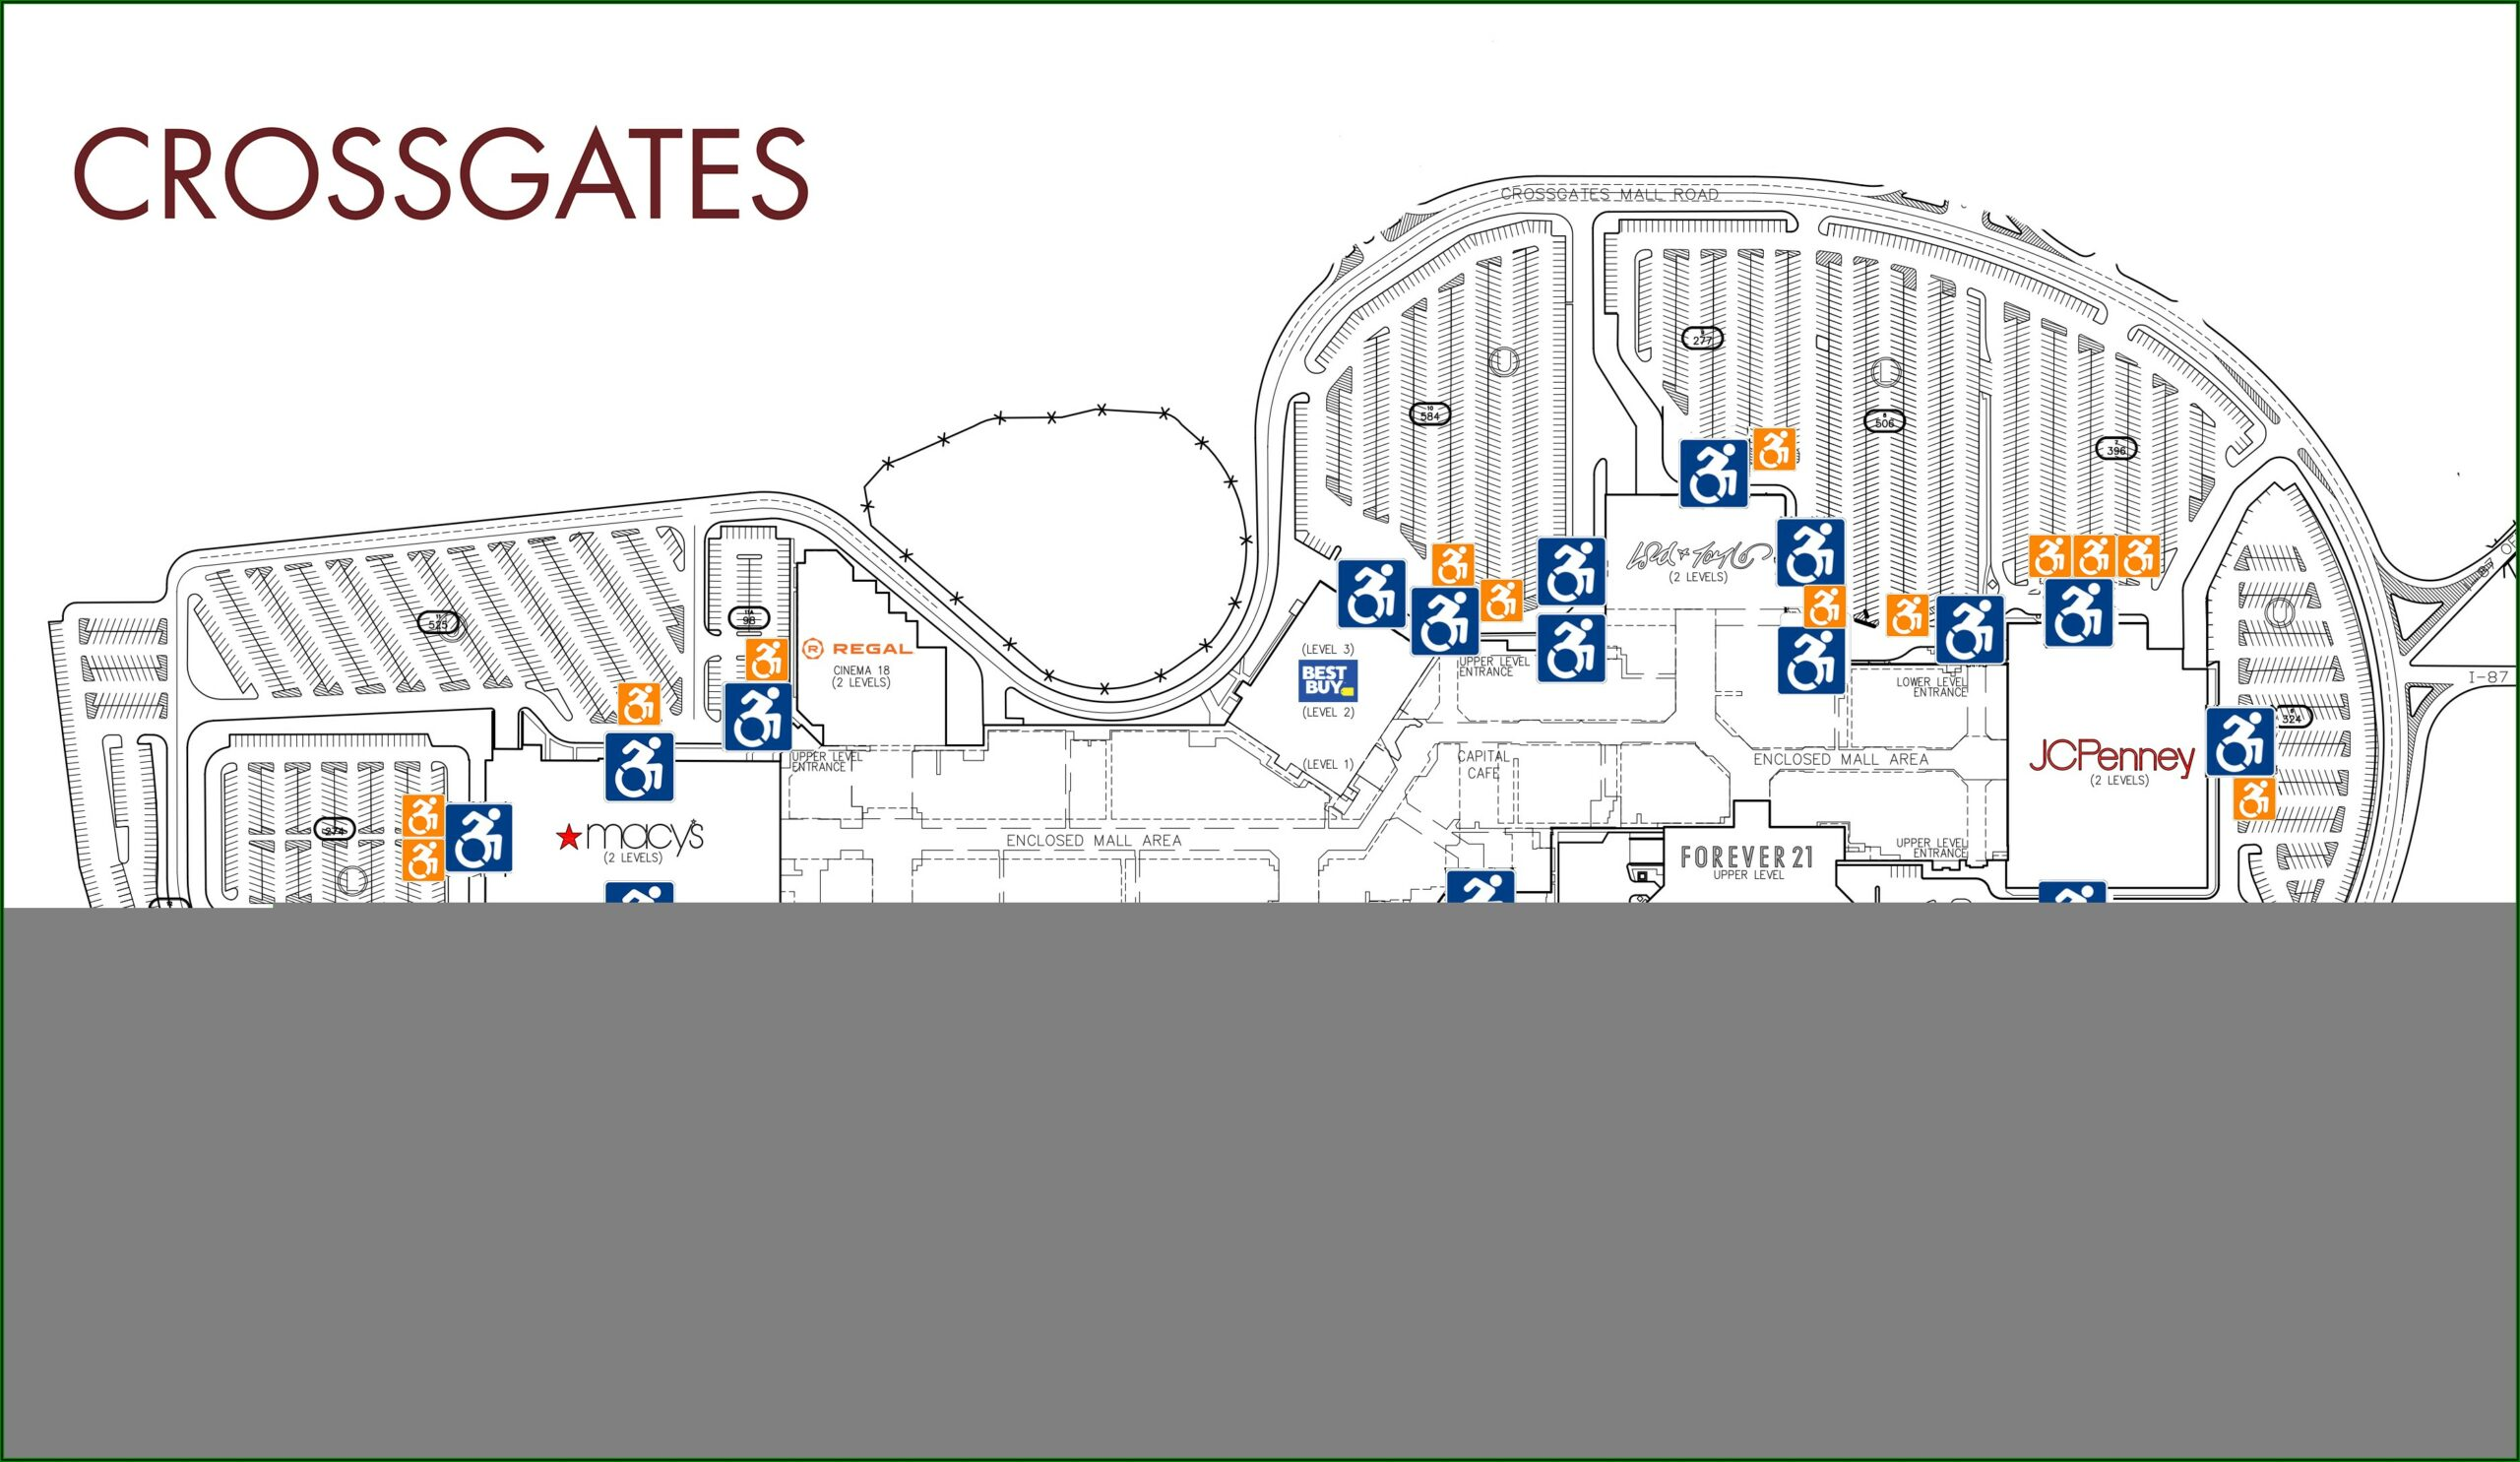 Crossgates Mall Map 2019